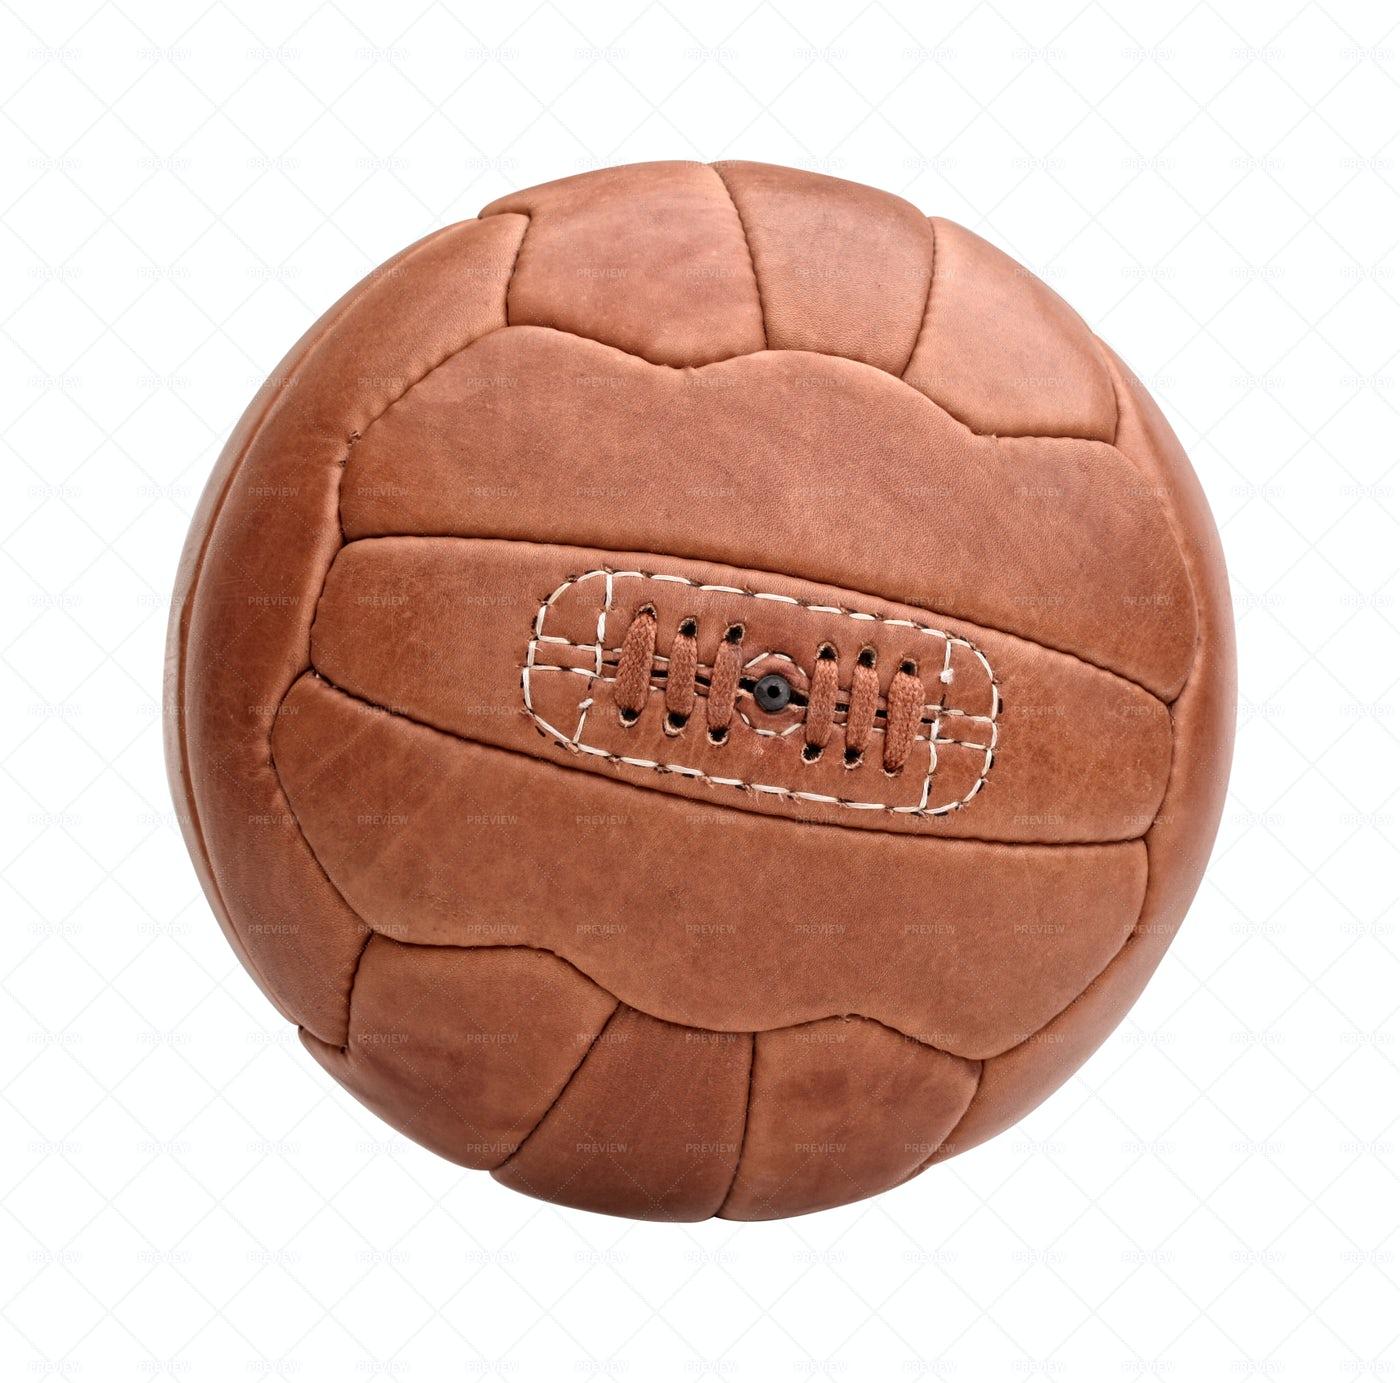 Vintage Soccer Ball Isolated: Stock Photos